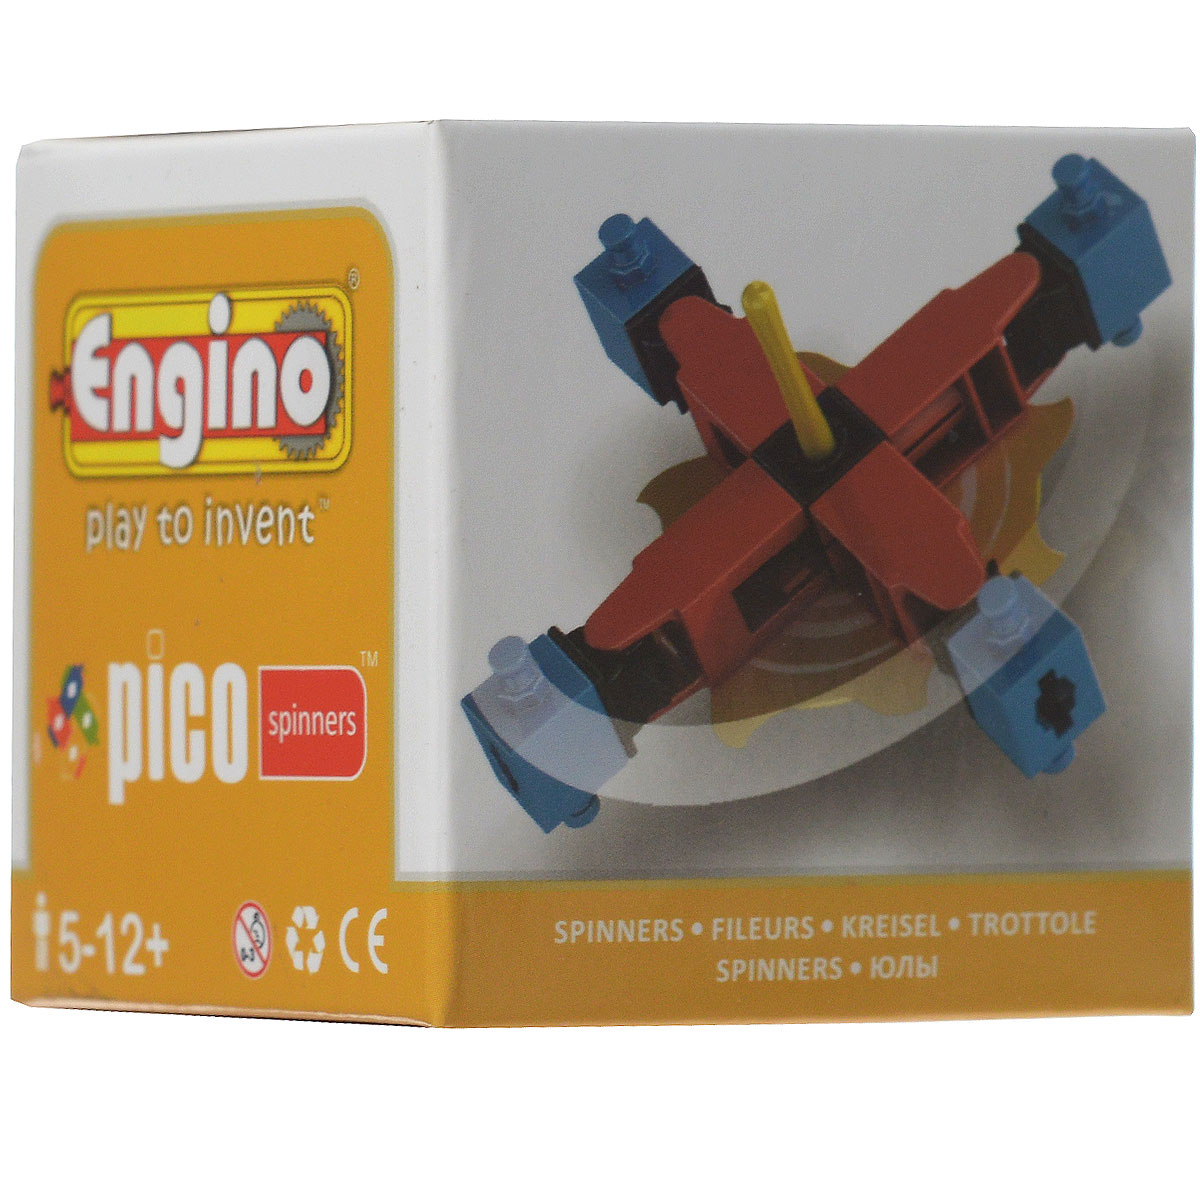 Engino Конструктор Spinners PS02 engino конструктор inventor приключения 170 элементов